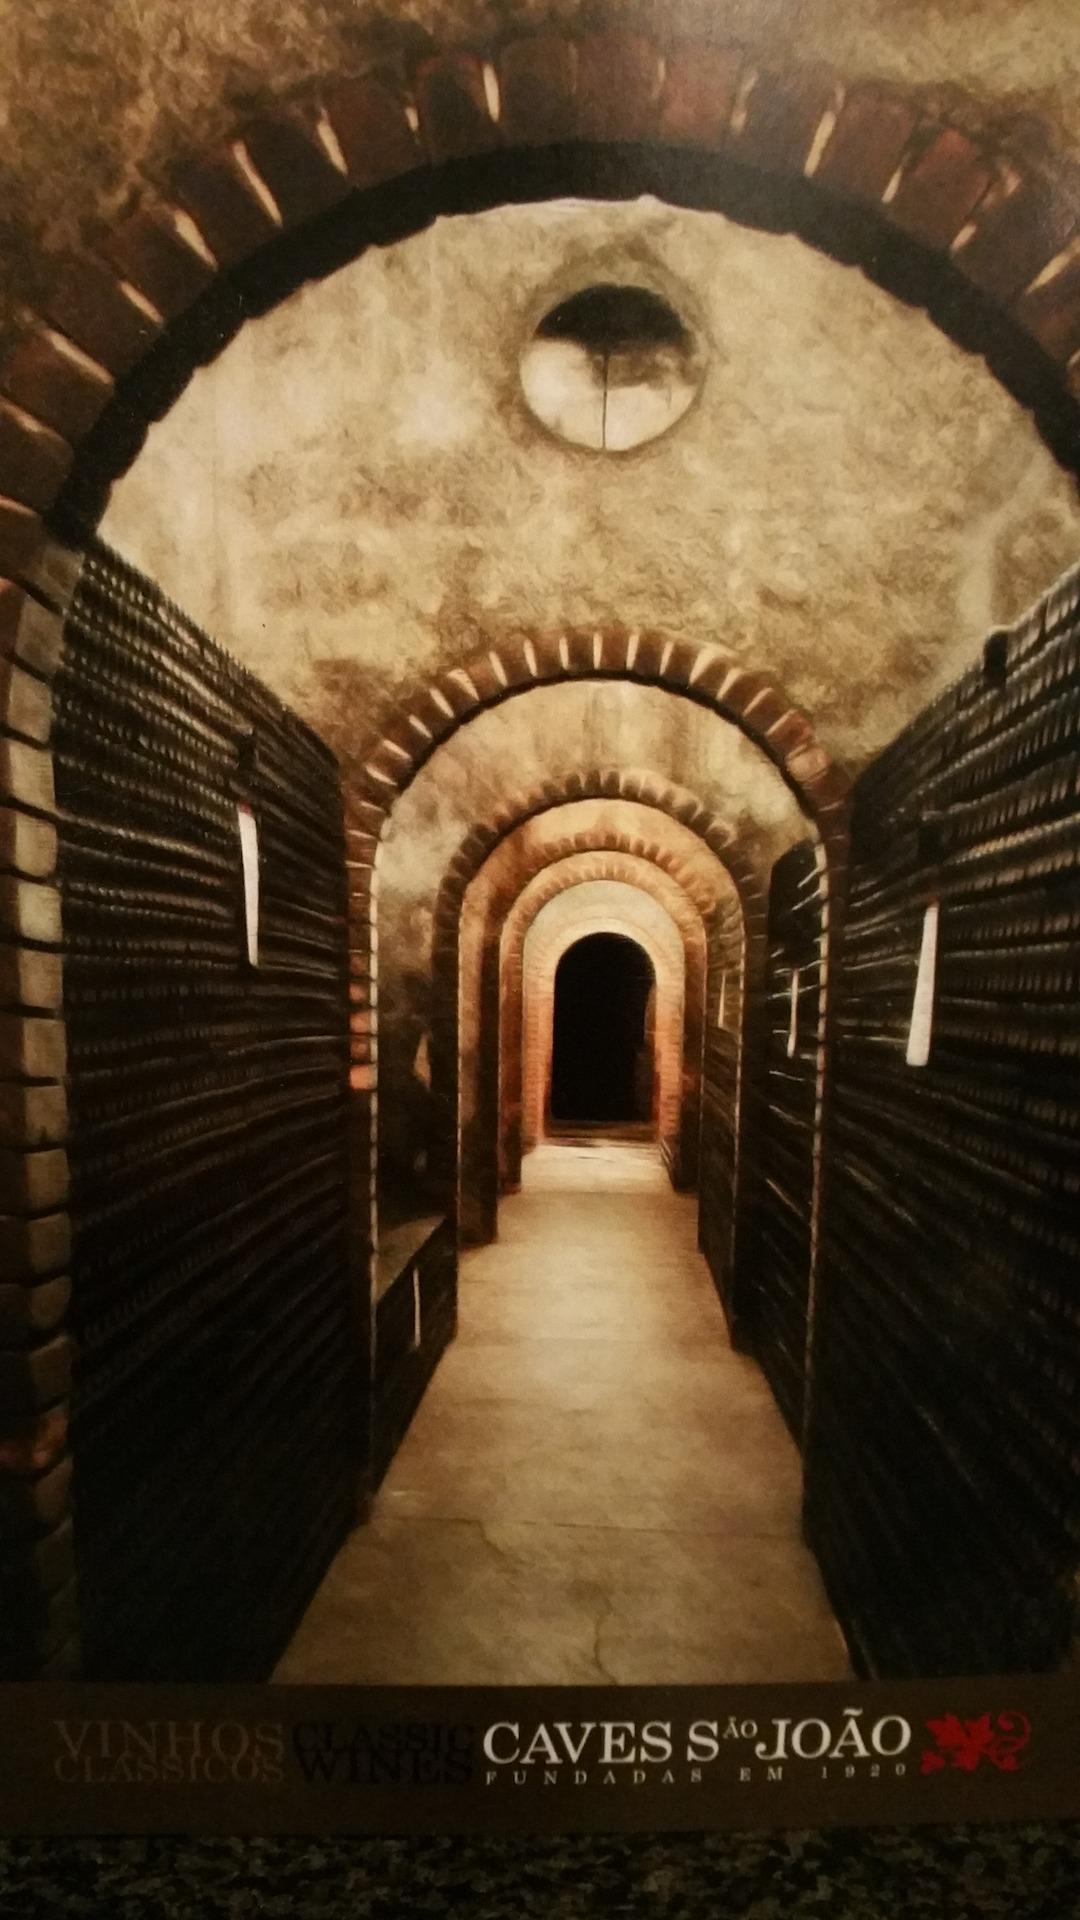 Wijnkelders Caves São João